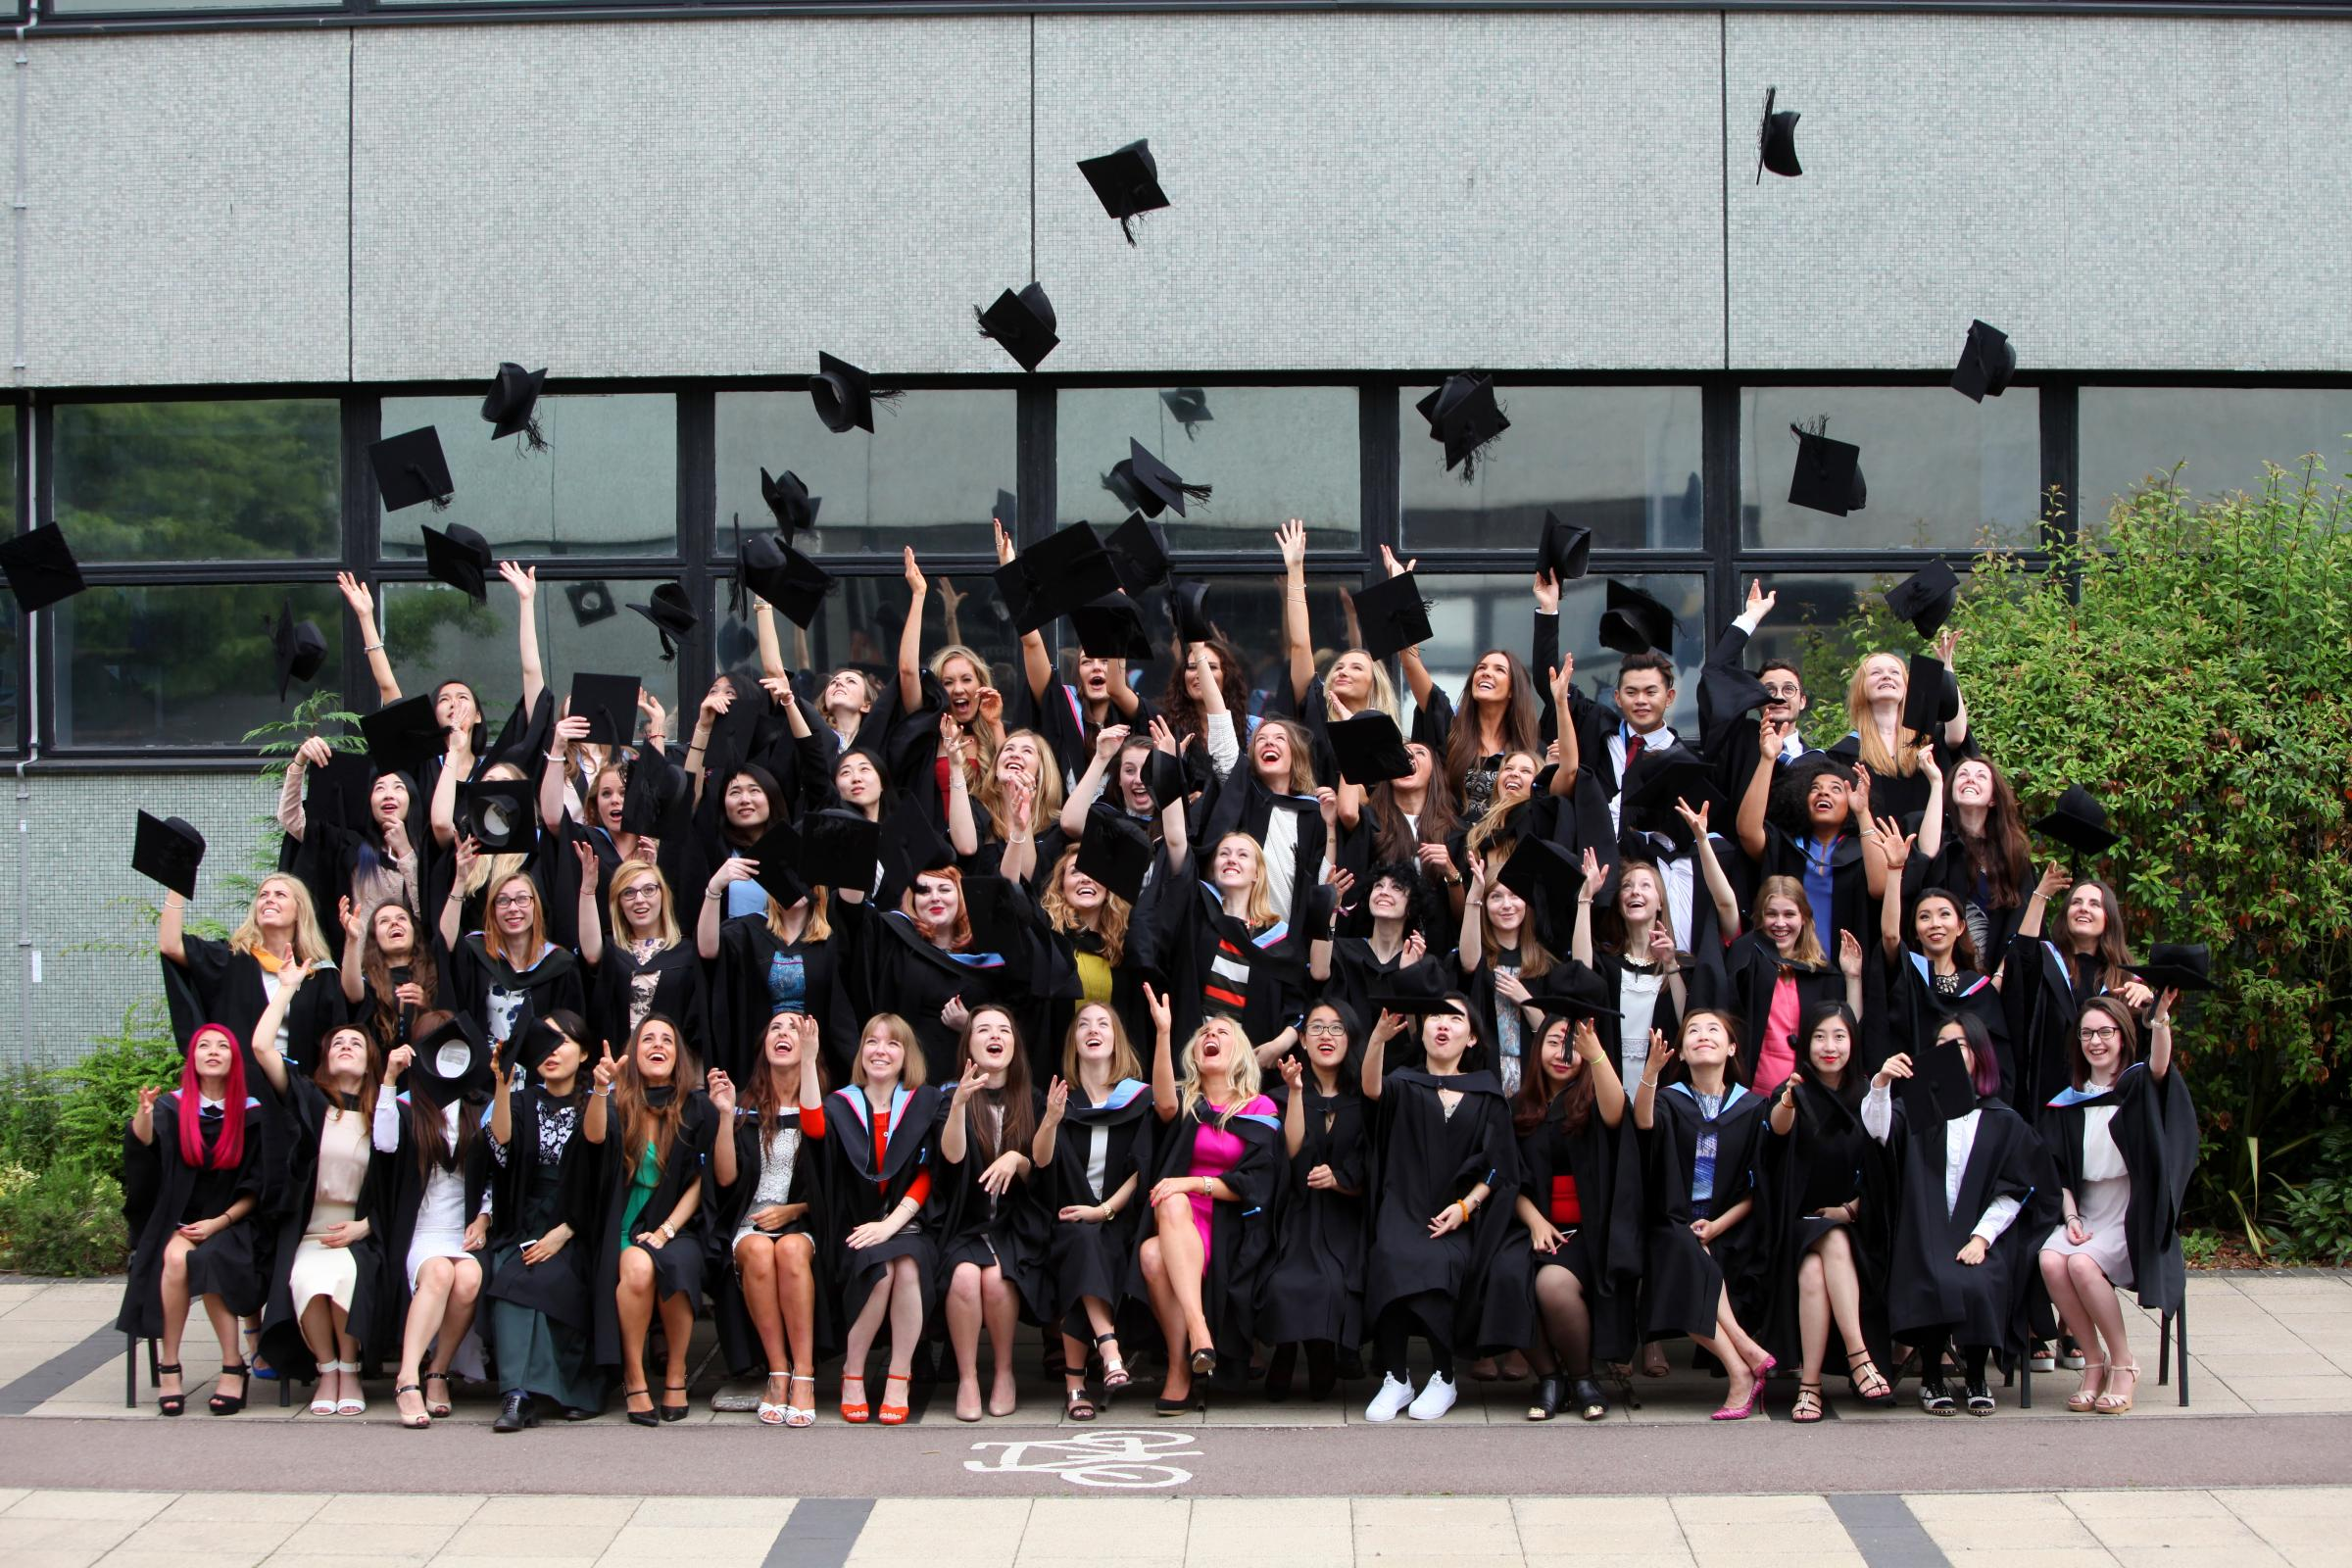 Pictures Hats Off To Hampshire Graduates Southampton News Newslocker